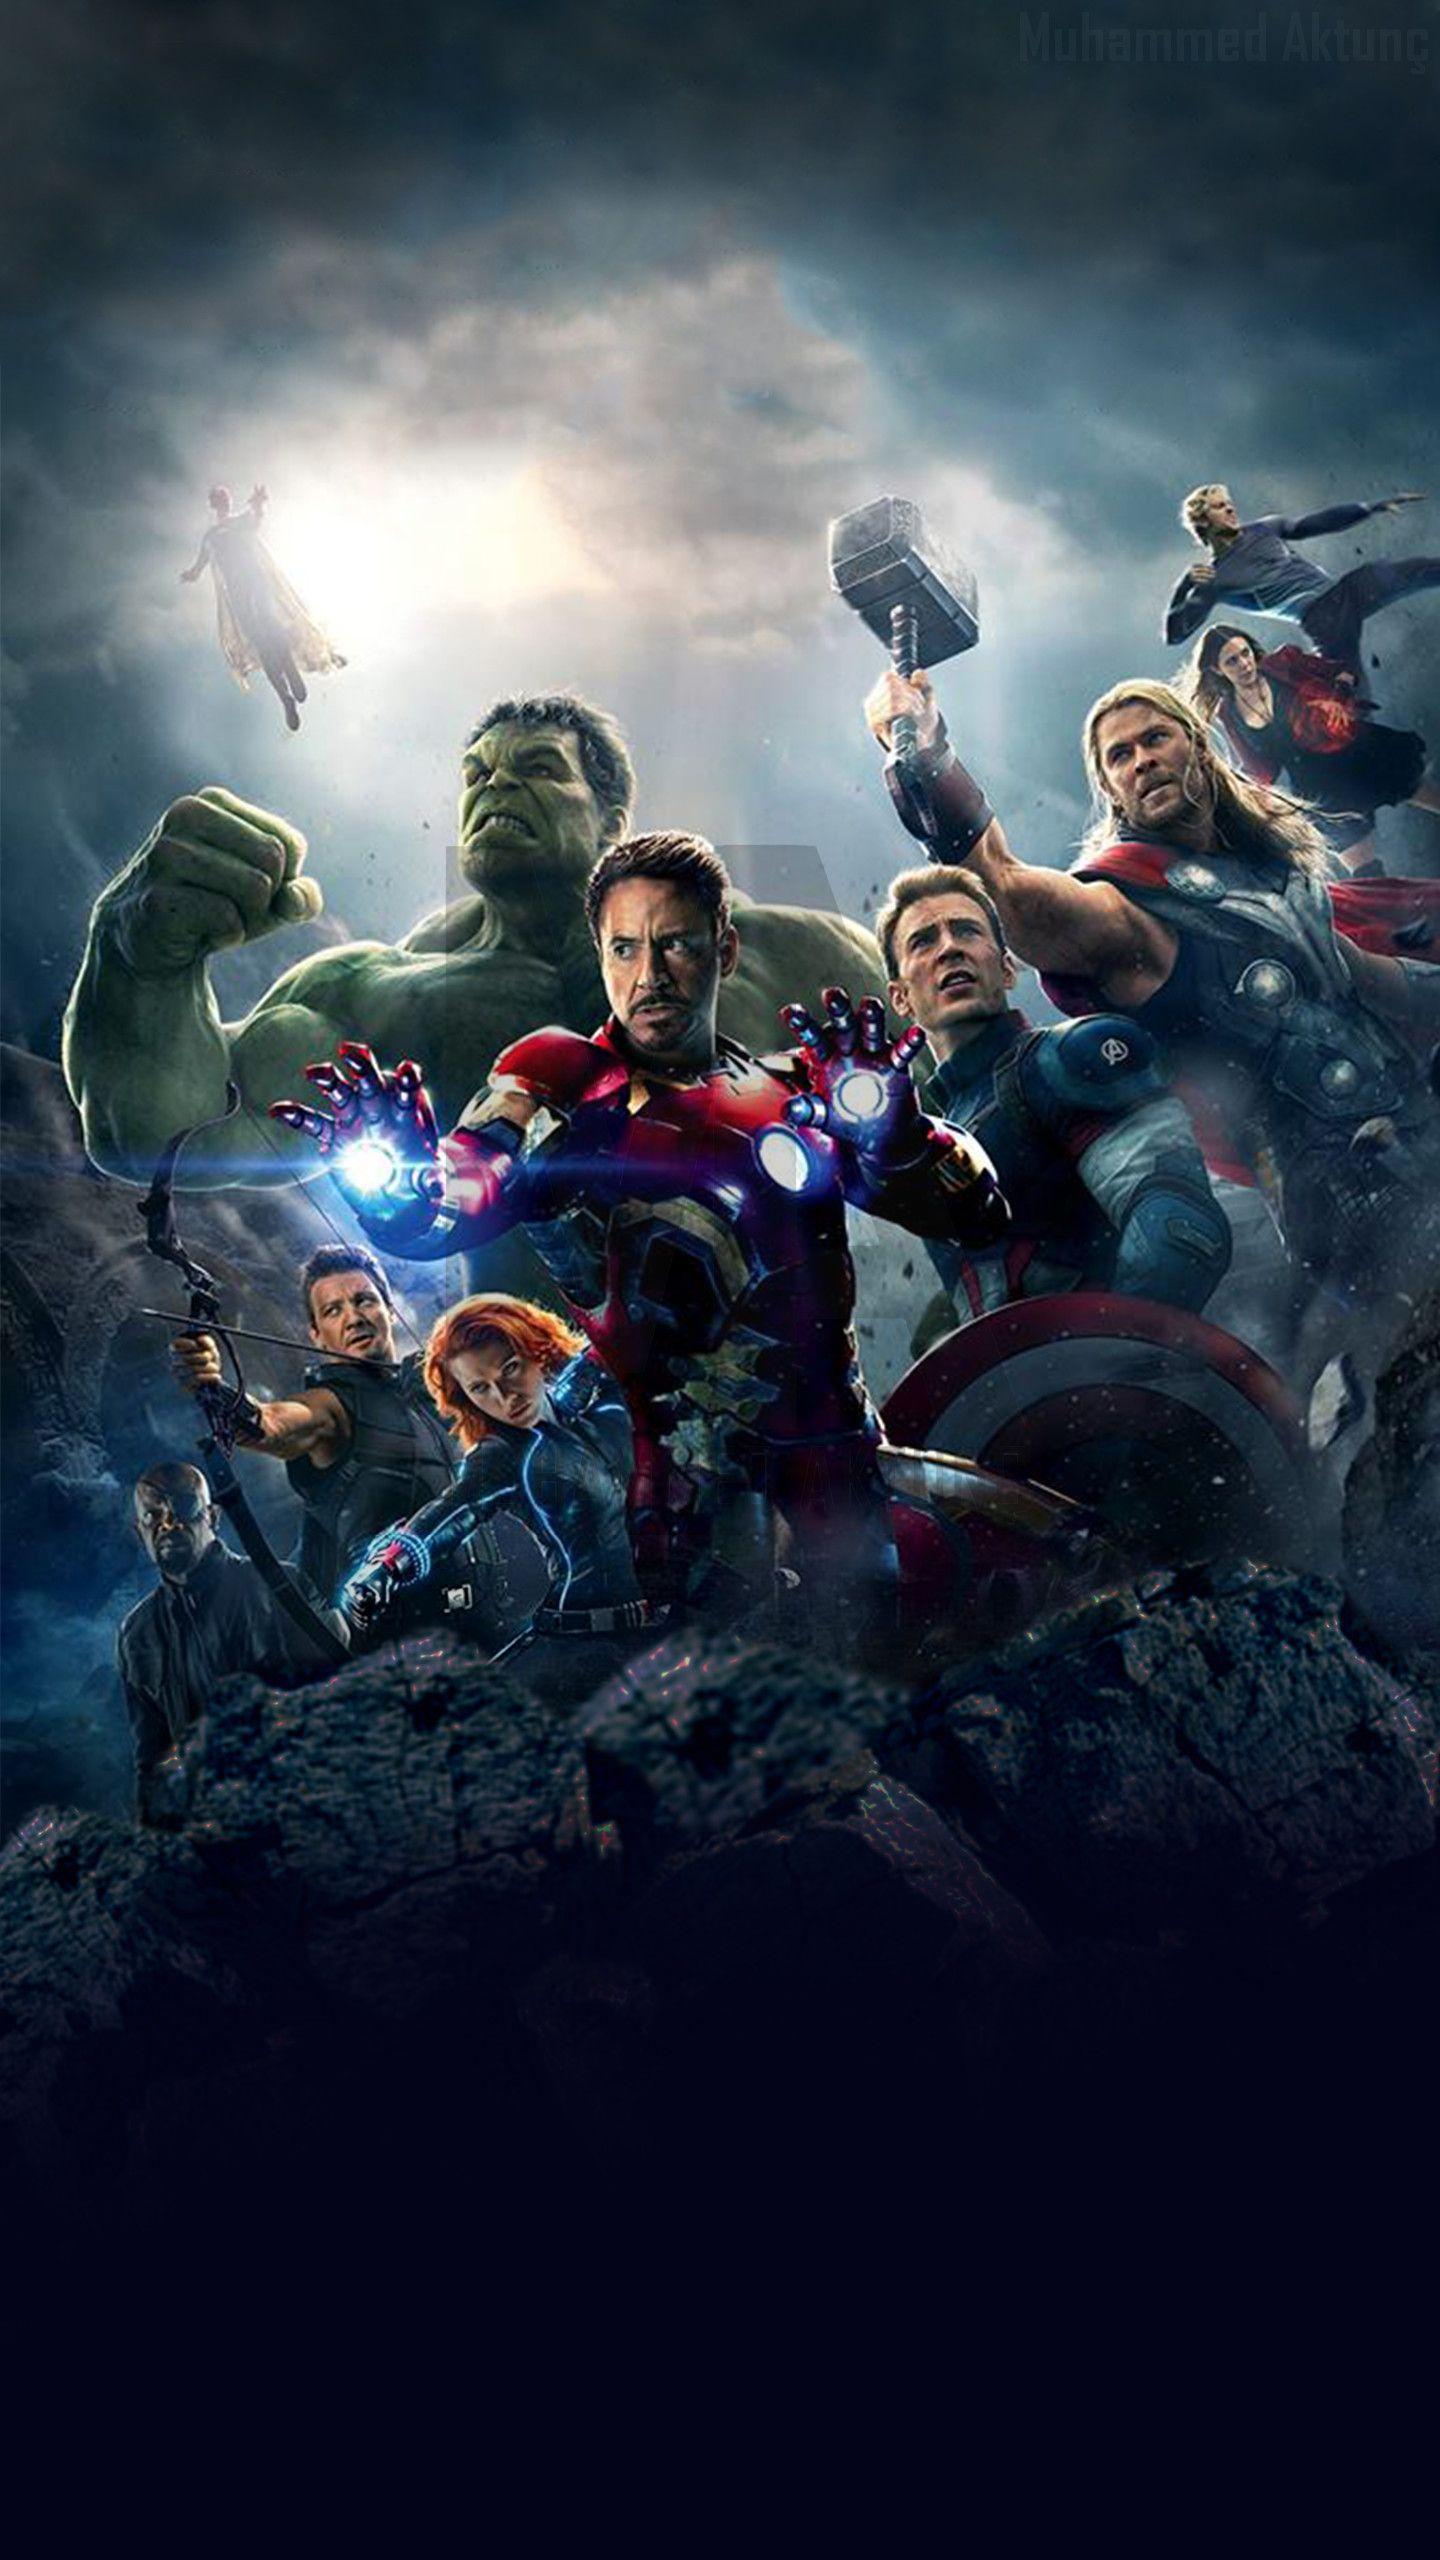 Iphone Xs Max Avengers Wallpaper : iphone, avengers, wallpaper, Marvel, IPhone, Wallpapers, Backgrounds, WallpaperAccess